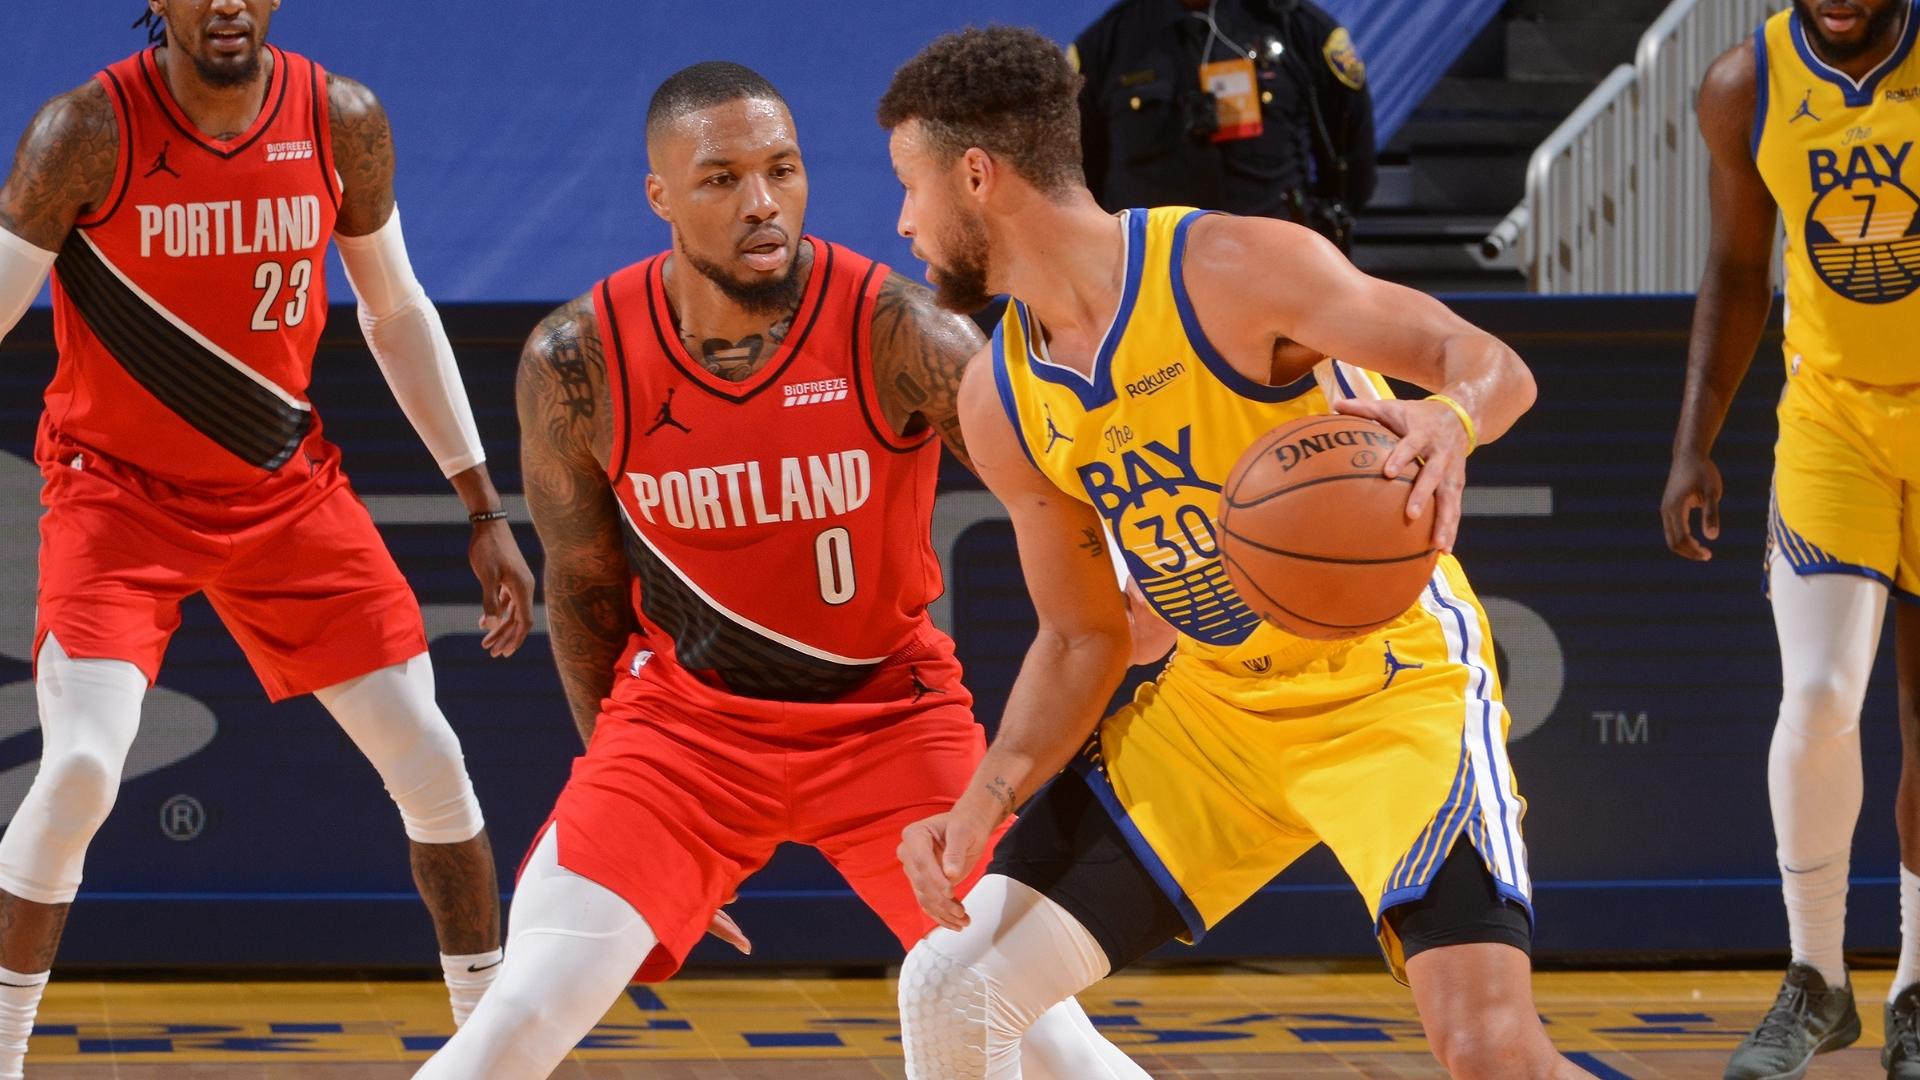 2021 NBA All-Star Voting: NBA.com Global Staff picks their final starting lineups - NBA IN